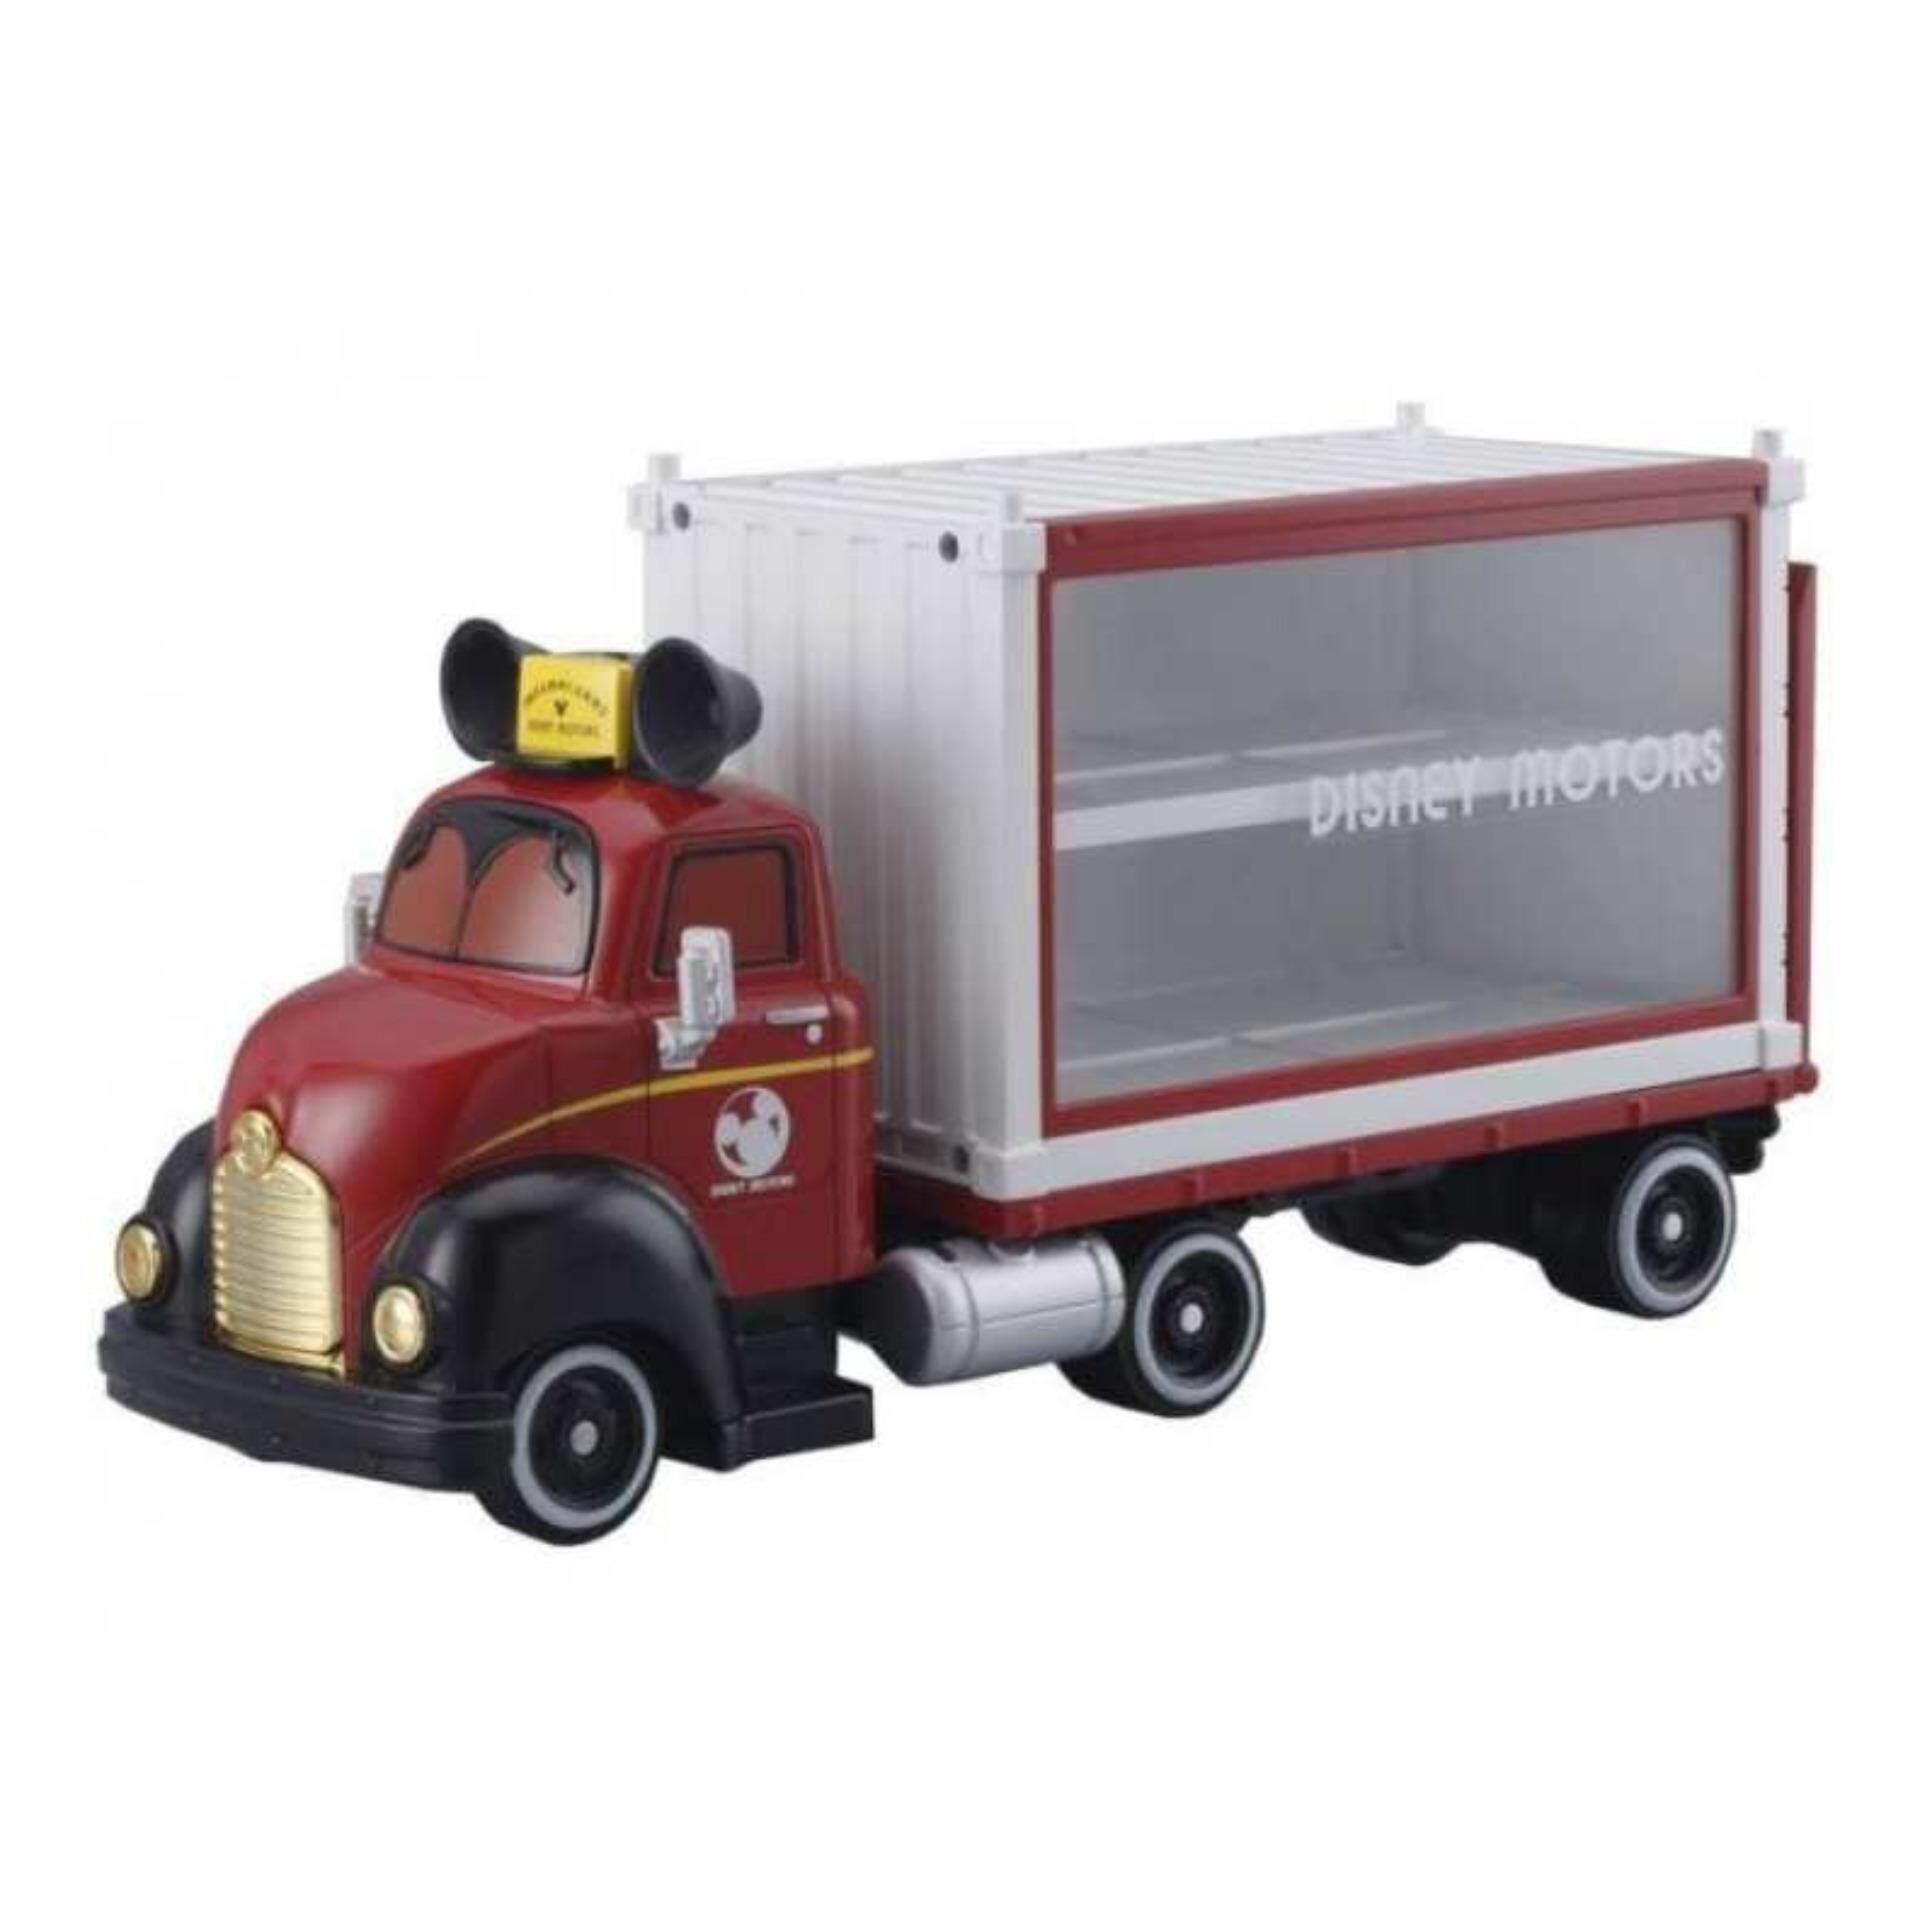 Takara Tomy Disney Motors Dream Carry Mickey Tomica Truck - Multicolour Toys for boys